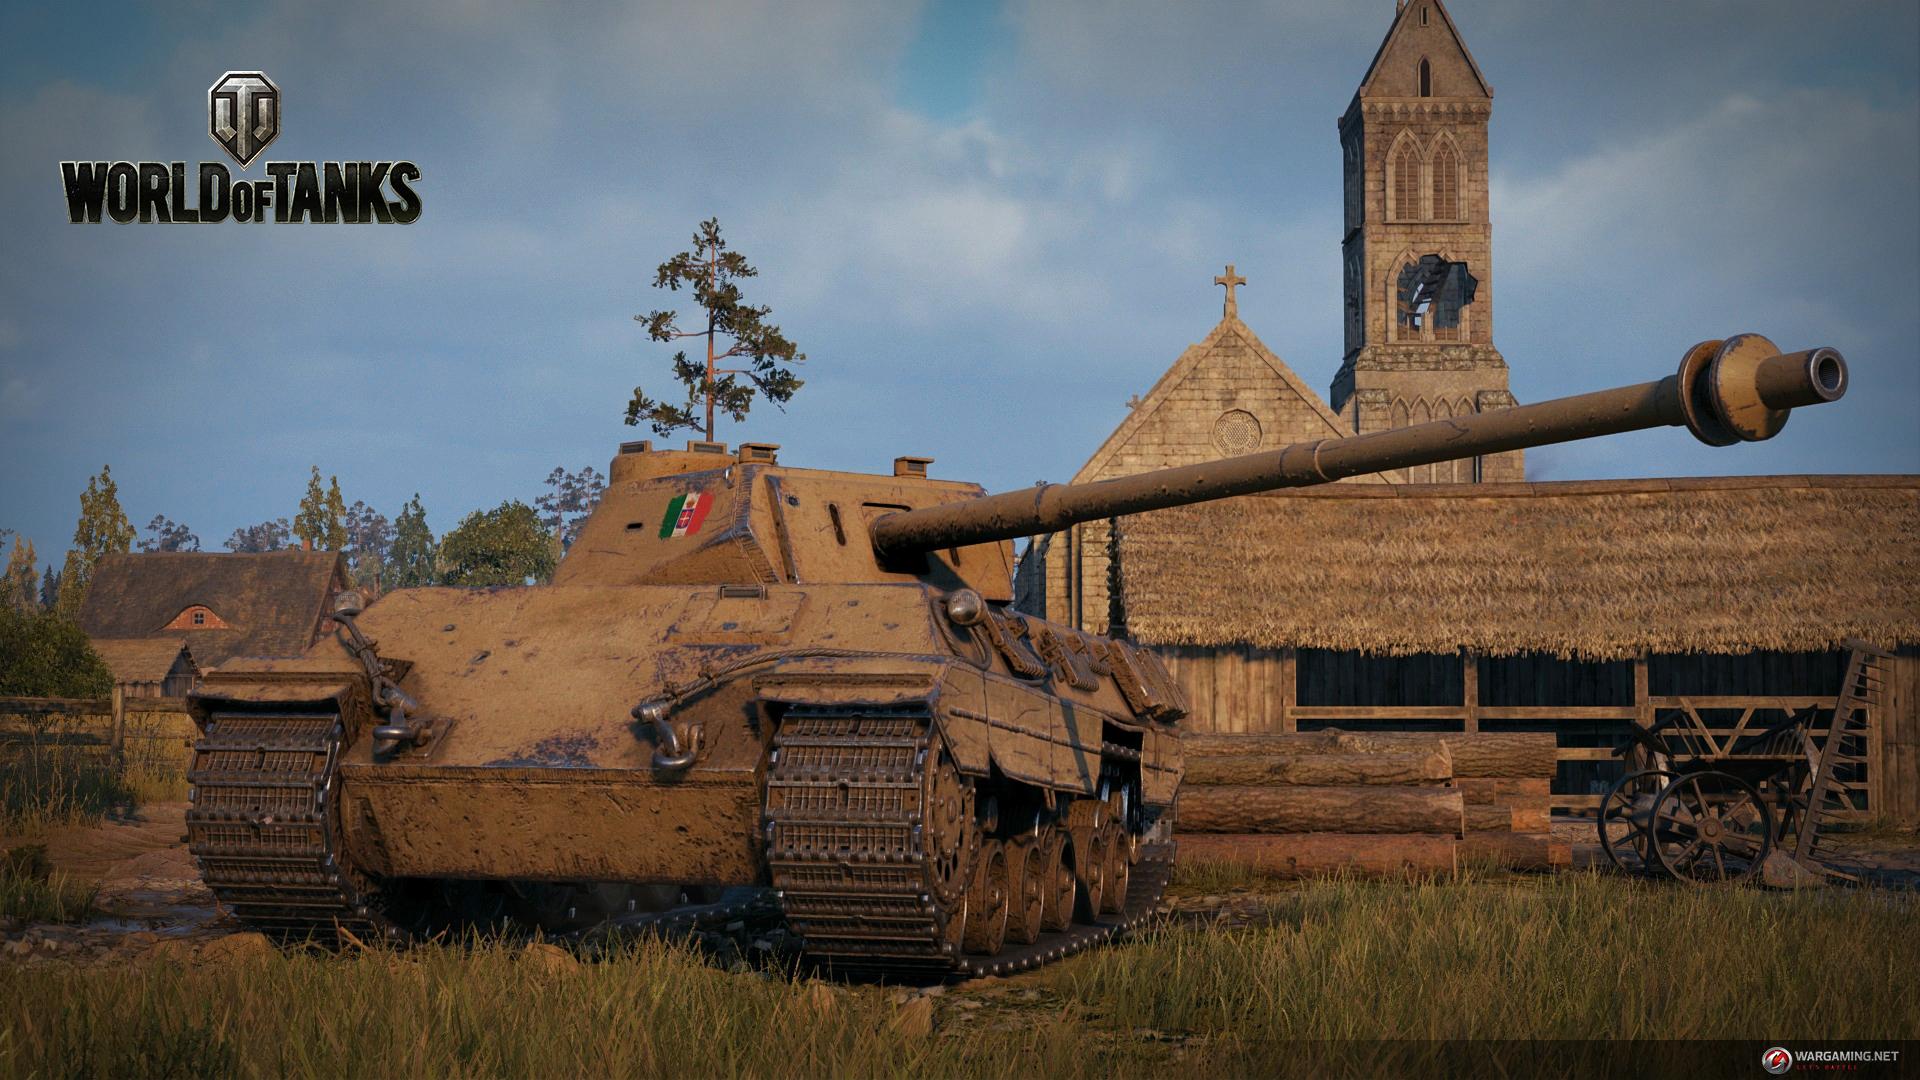 http://www.idgtv.es/archivos/201805/world-of-tanks-italia-tank.jpg